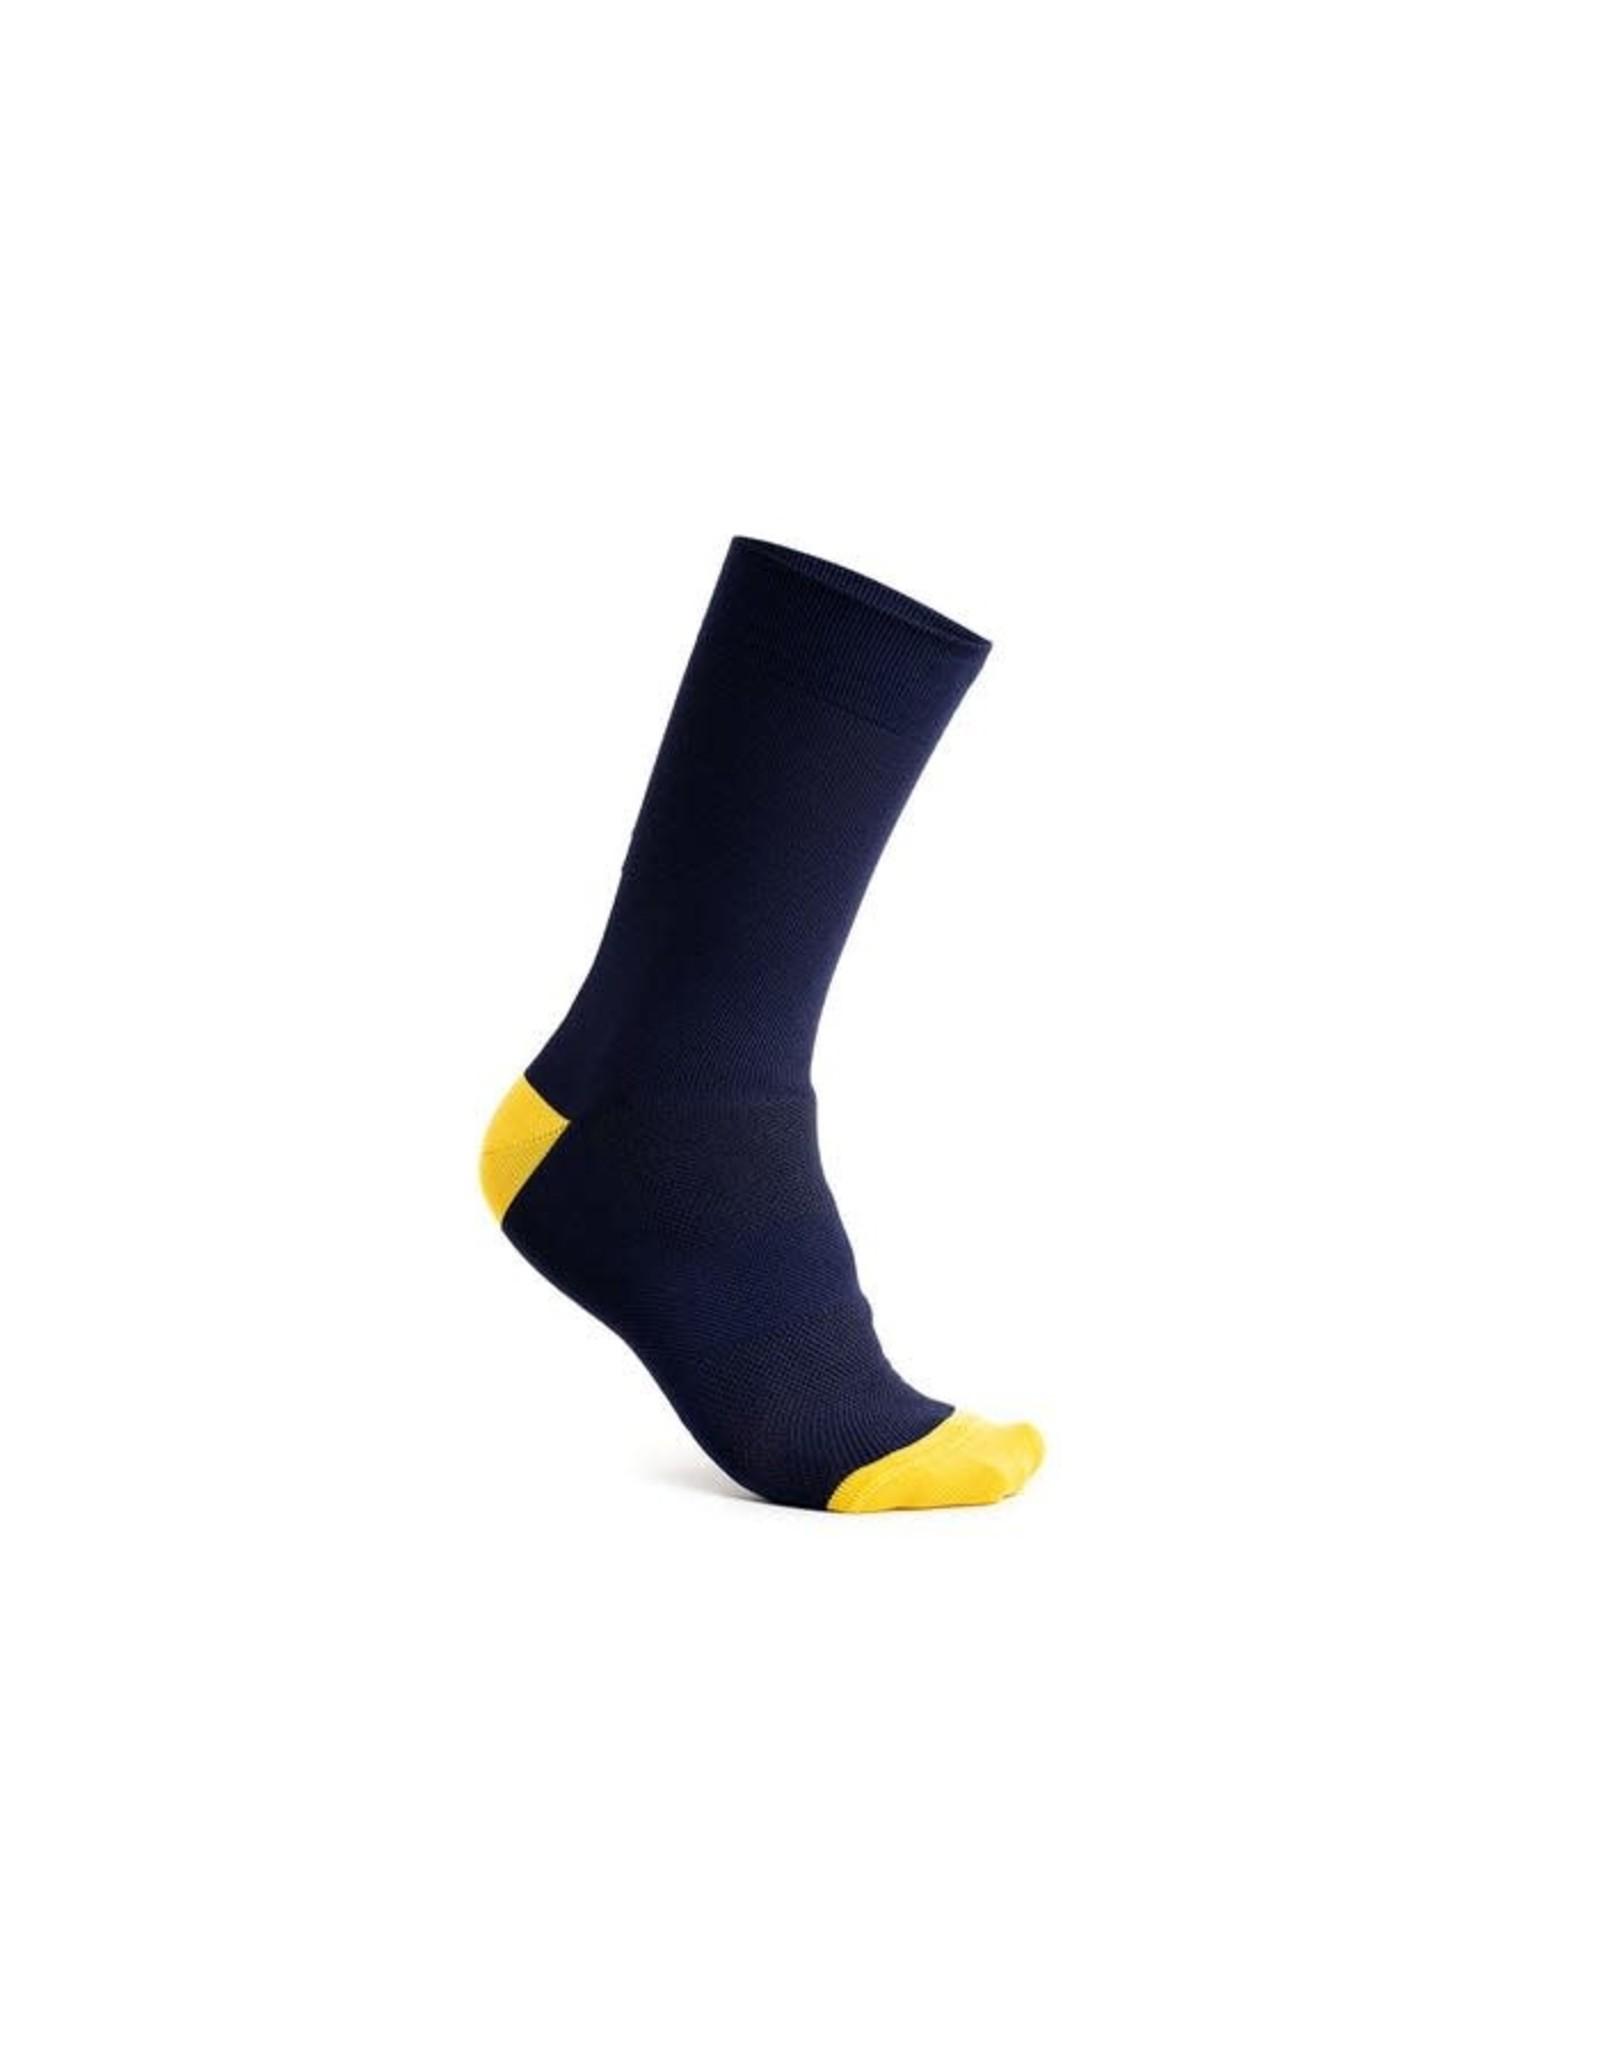 7MESH 7MESH - Word Sock Eclipse XL